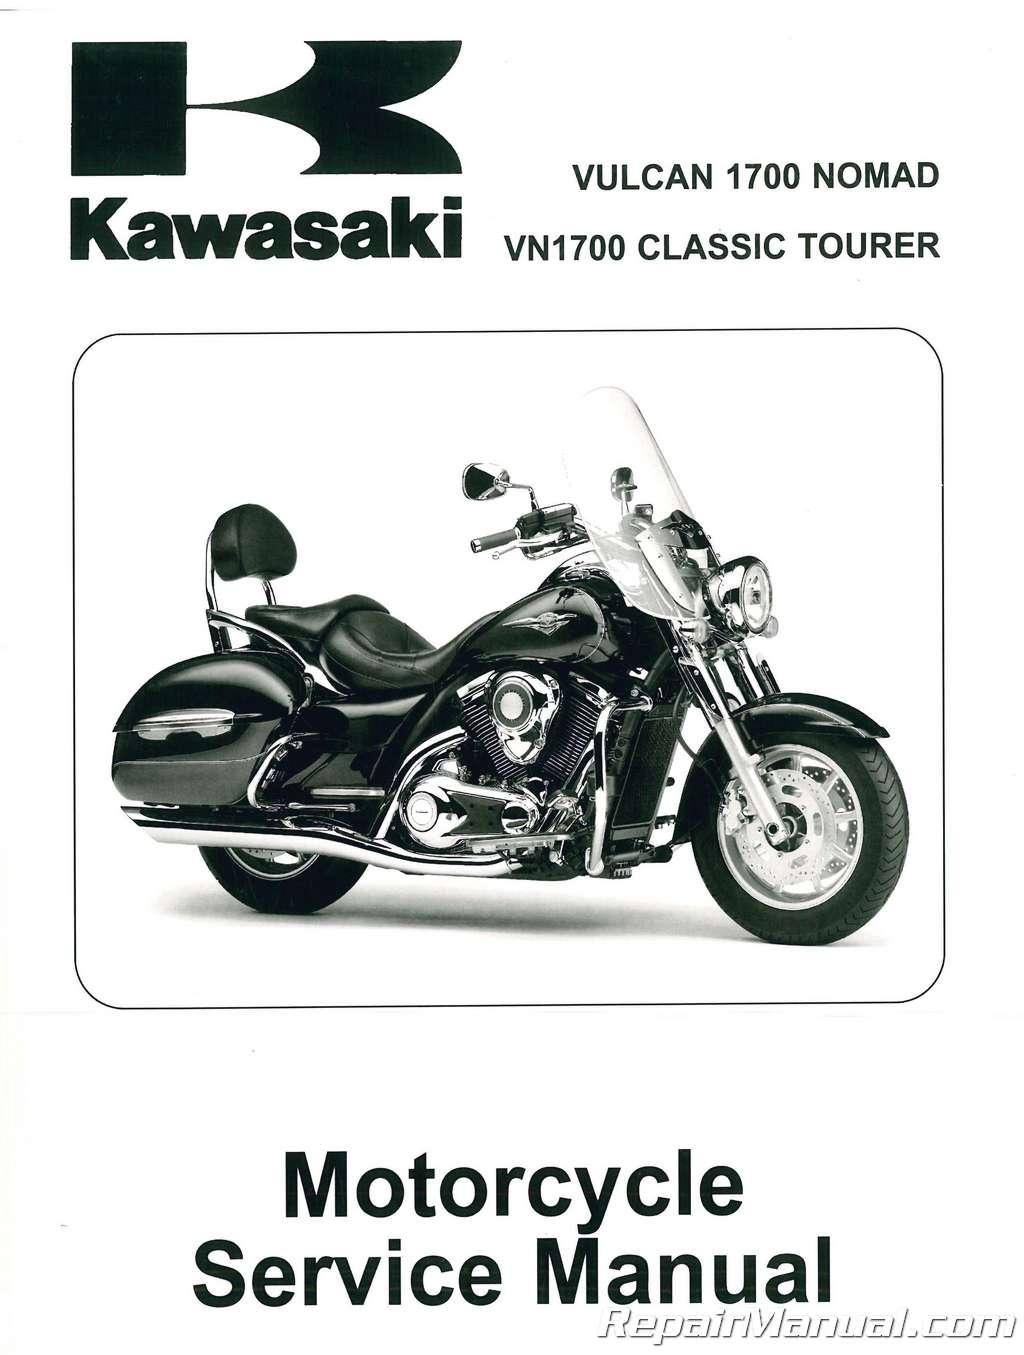 2009-Kawasaki-VN1700C-Vulcan-Nomad-Service-Manual_001.jpg ...